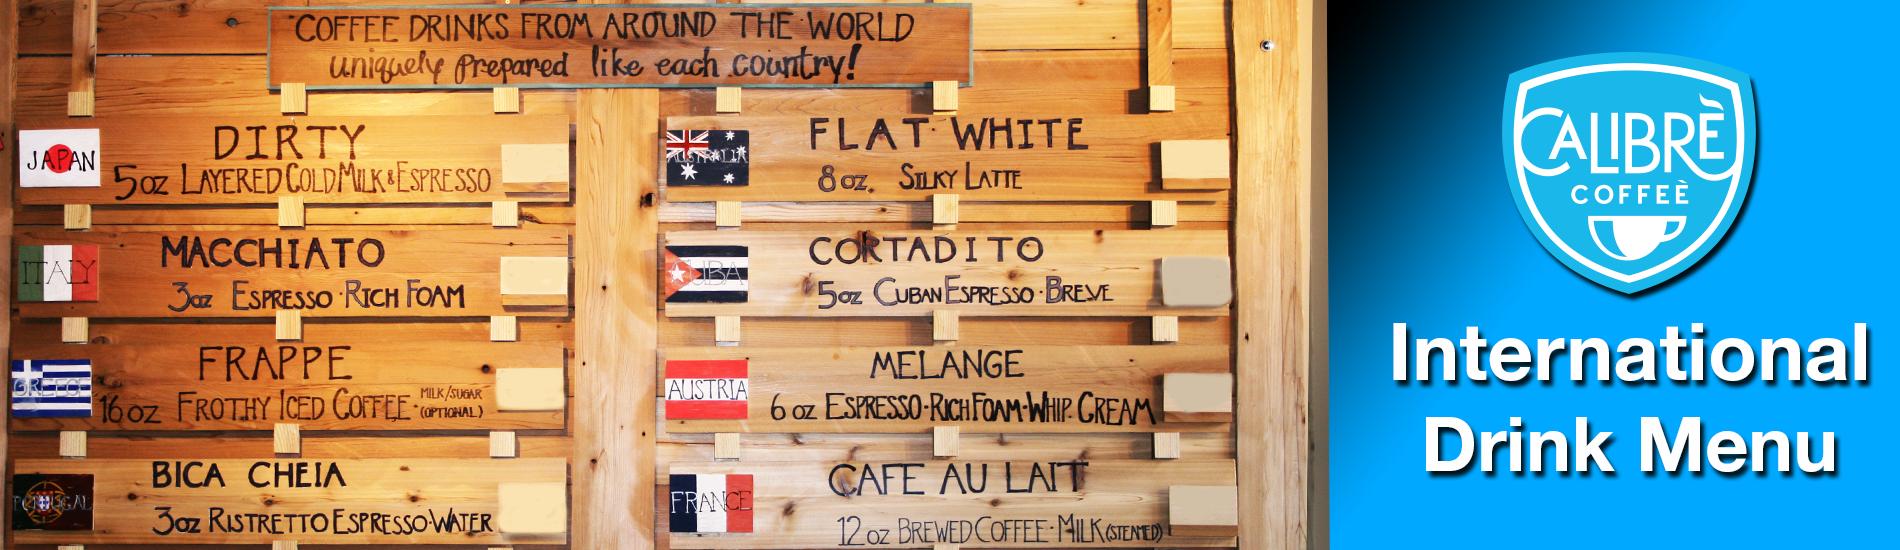 Sliders-Nimva-Calibre-slides-international-coffee5